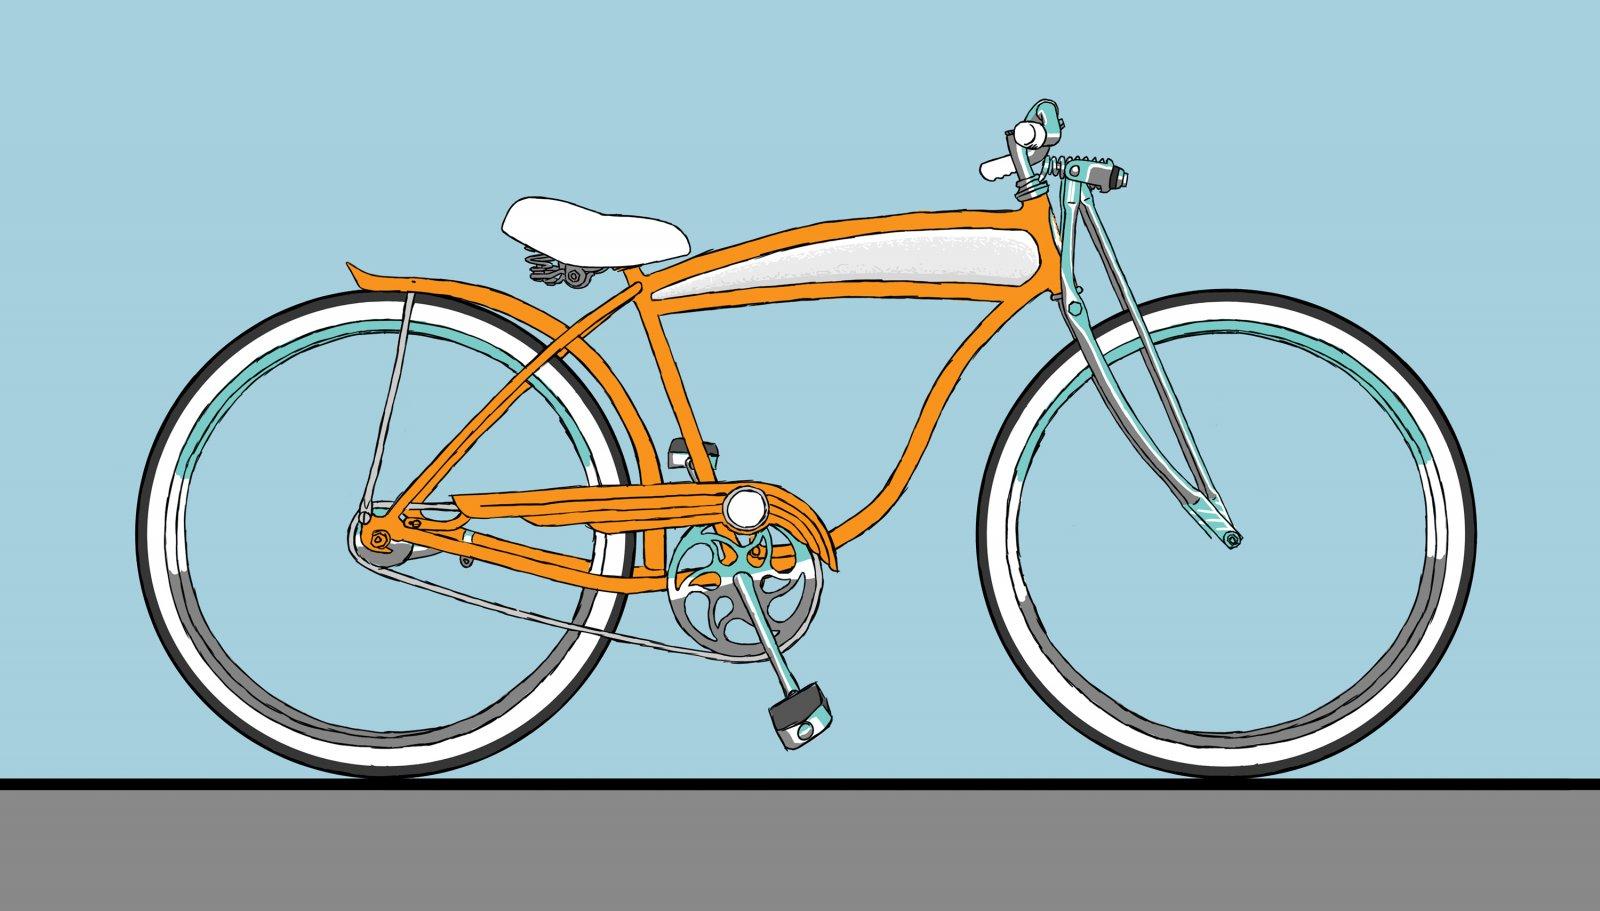 bftd_dreamcycle_rrbbo_mockup_scaled-jpg.jpg